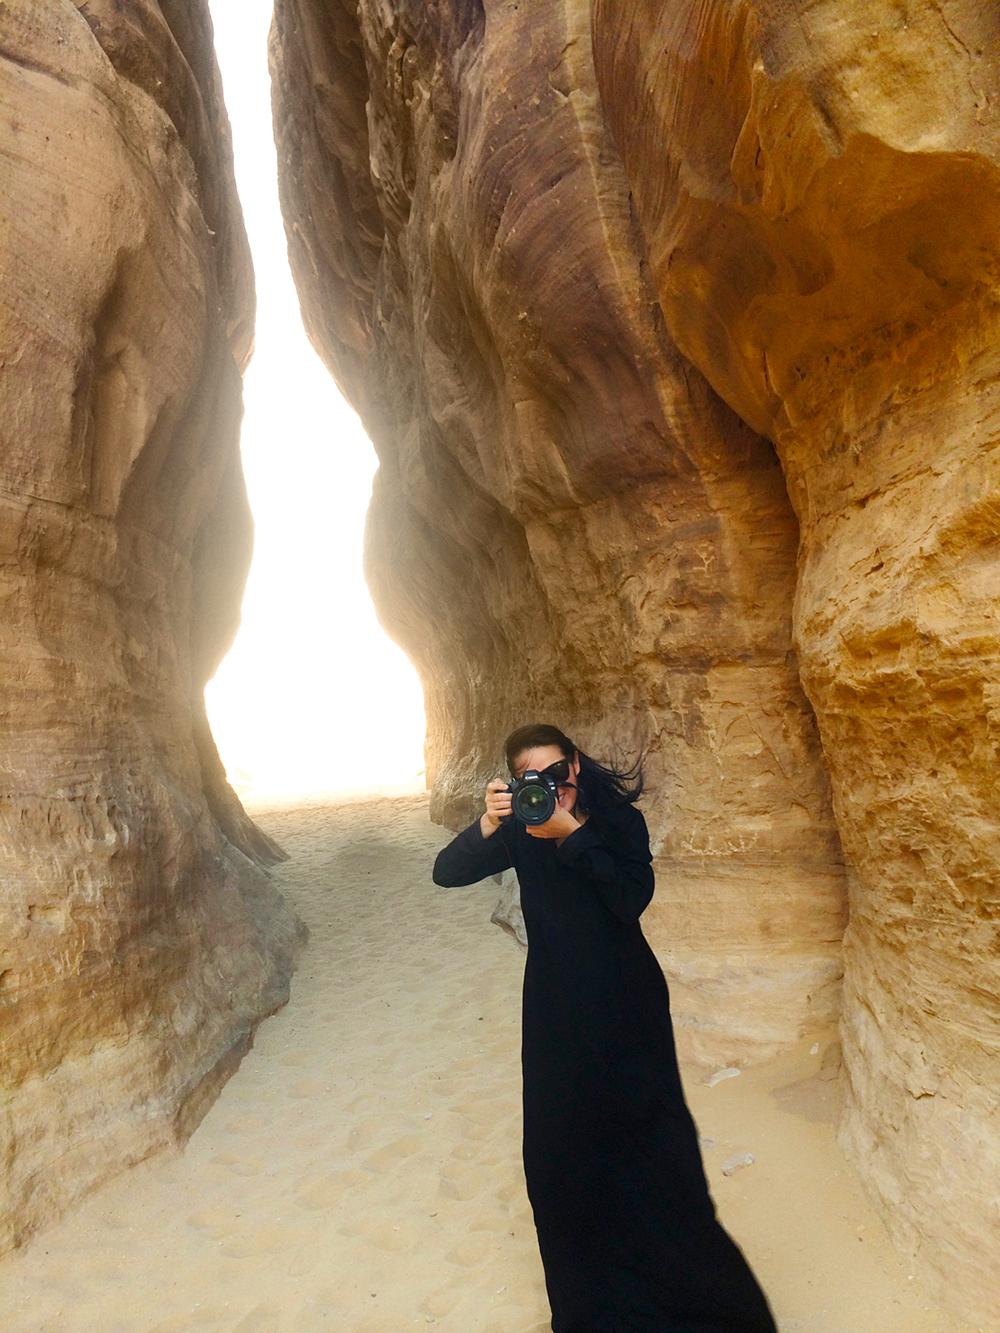 Photographer  Connie Zhou  captures Mada in Saleh.